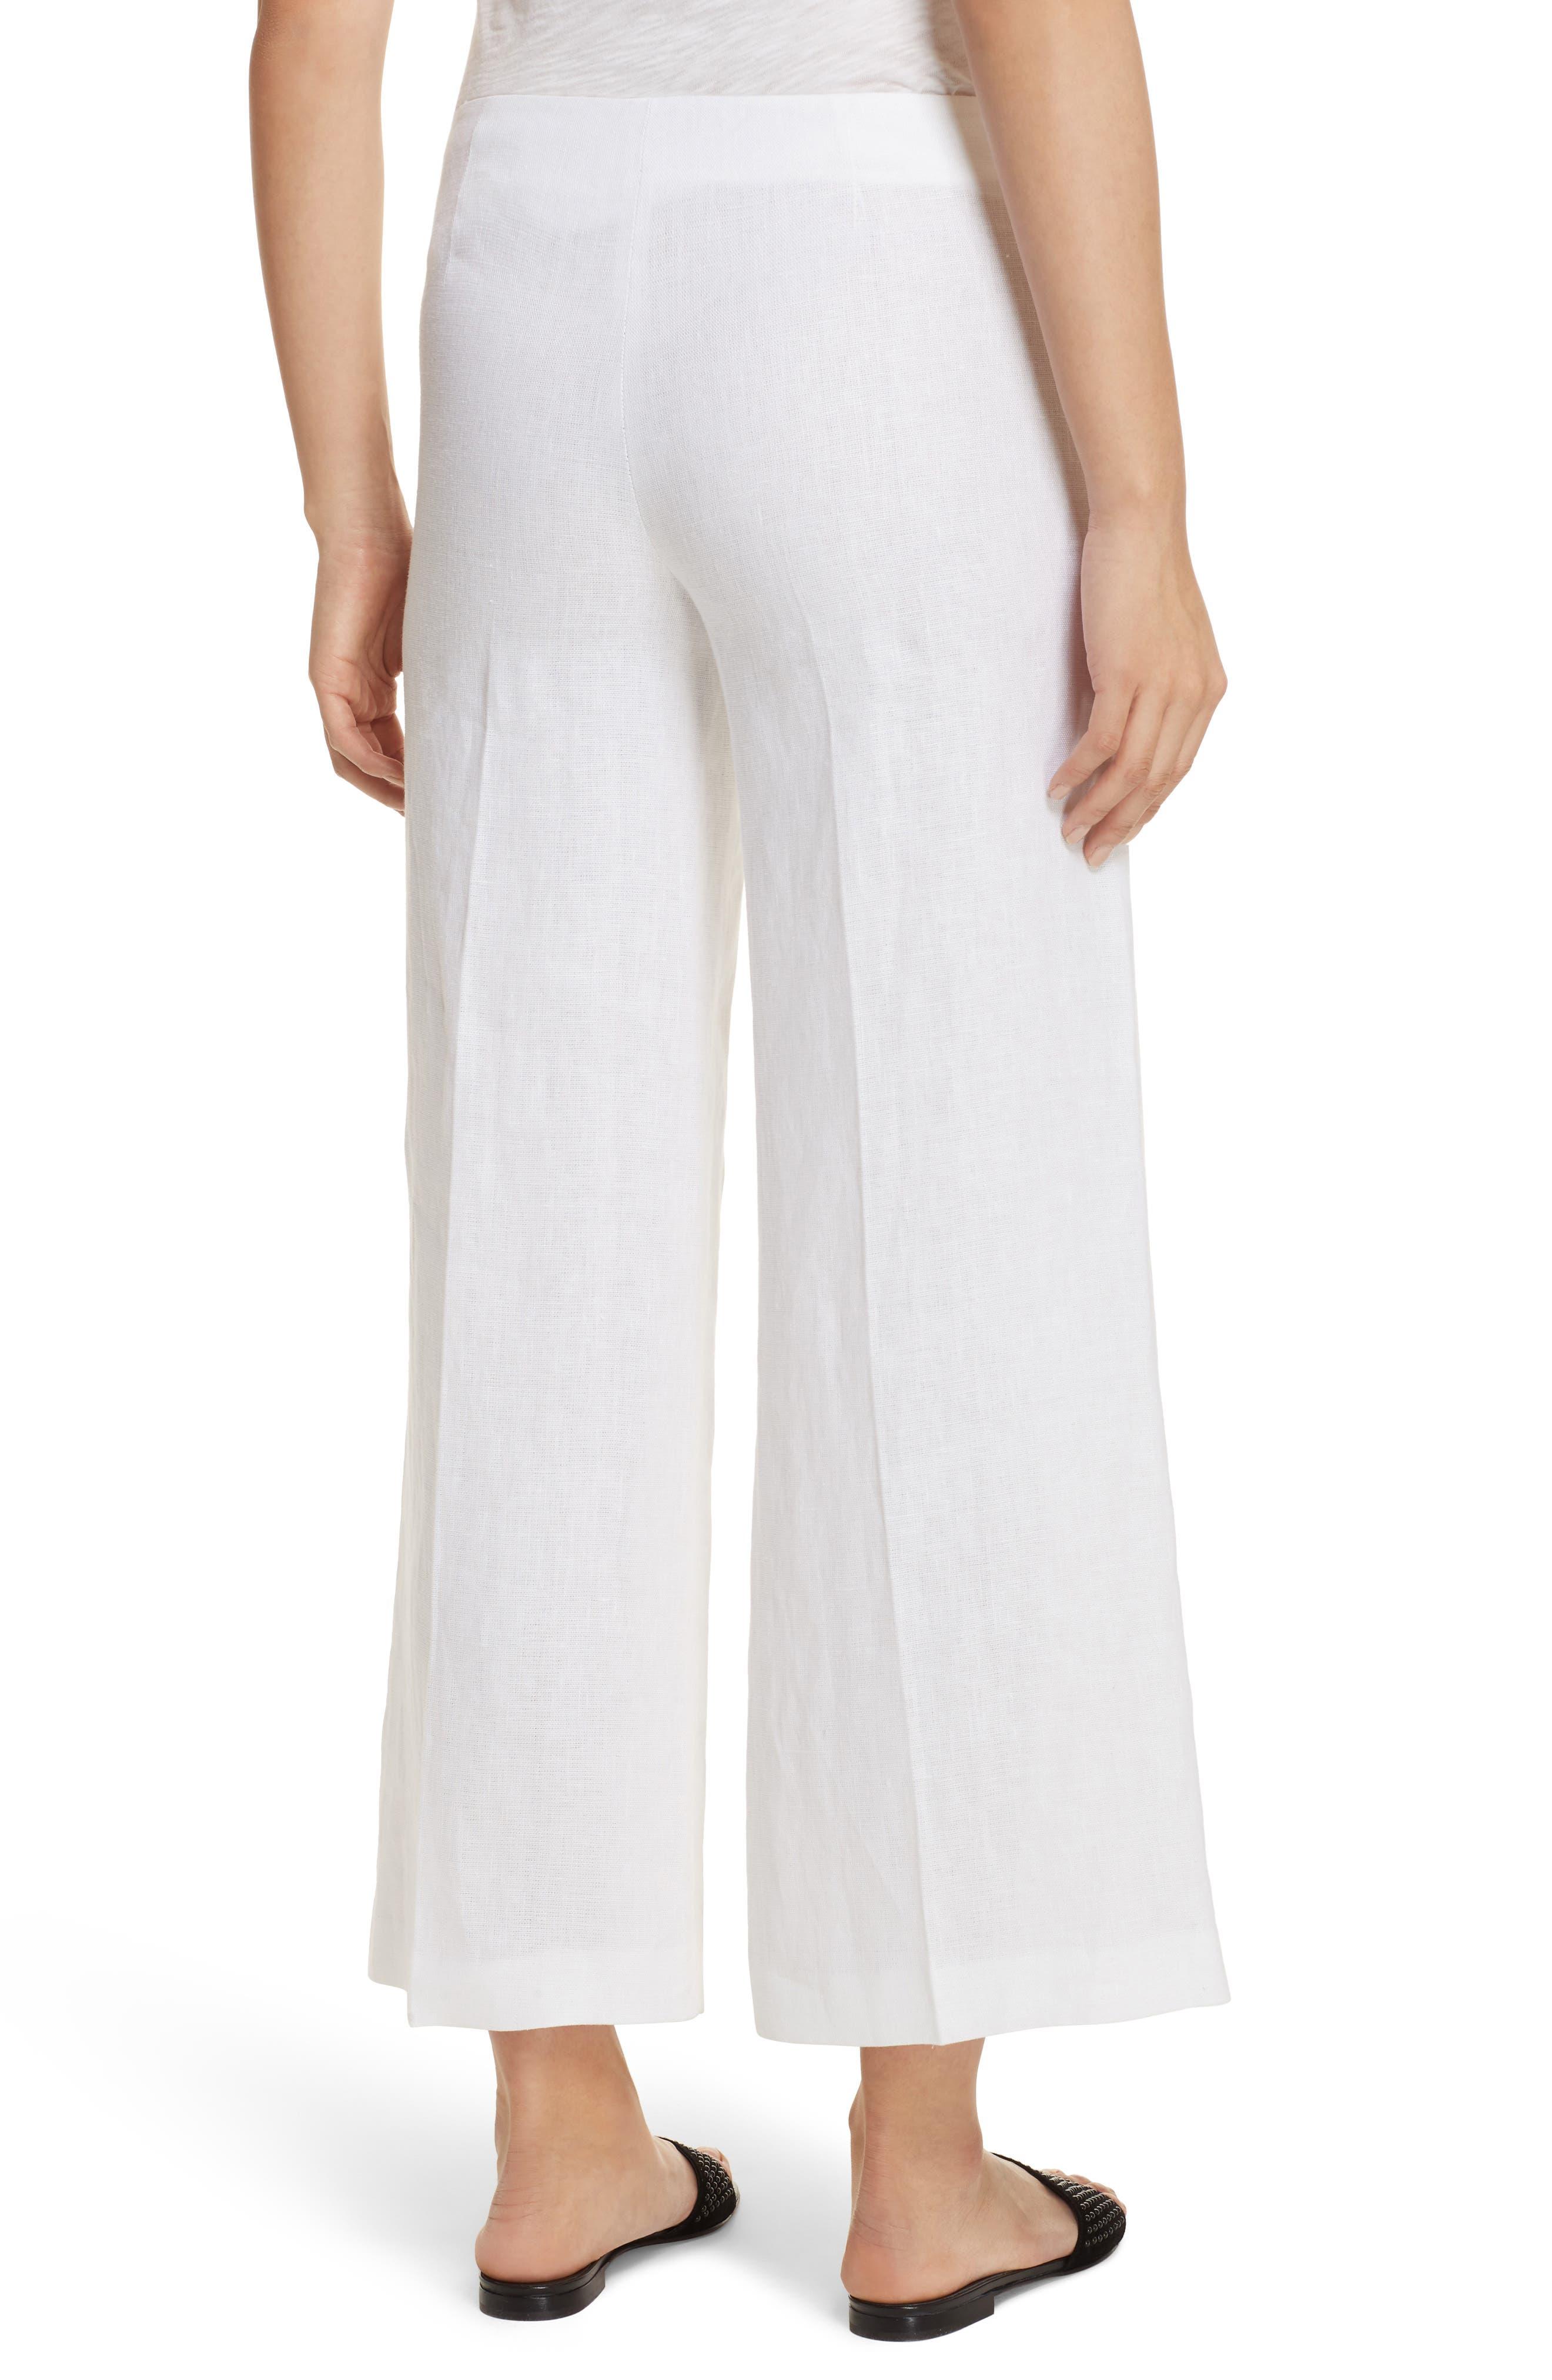 Terena B Linen Wide Leg Pants,                             Alternate thumbnail 2, color,                             White